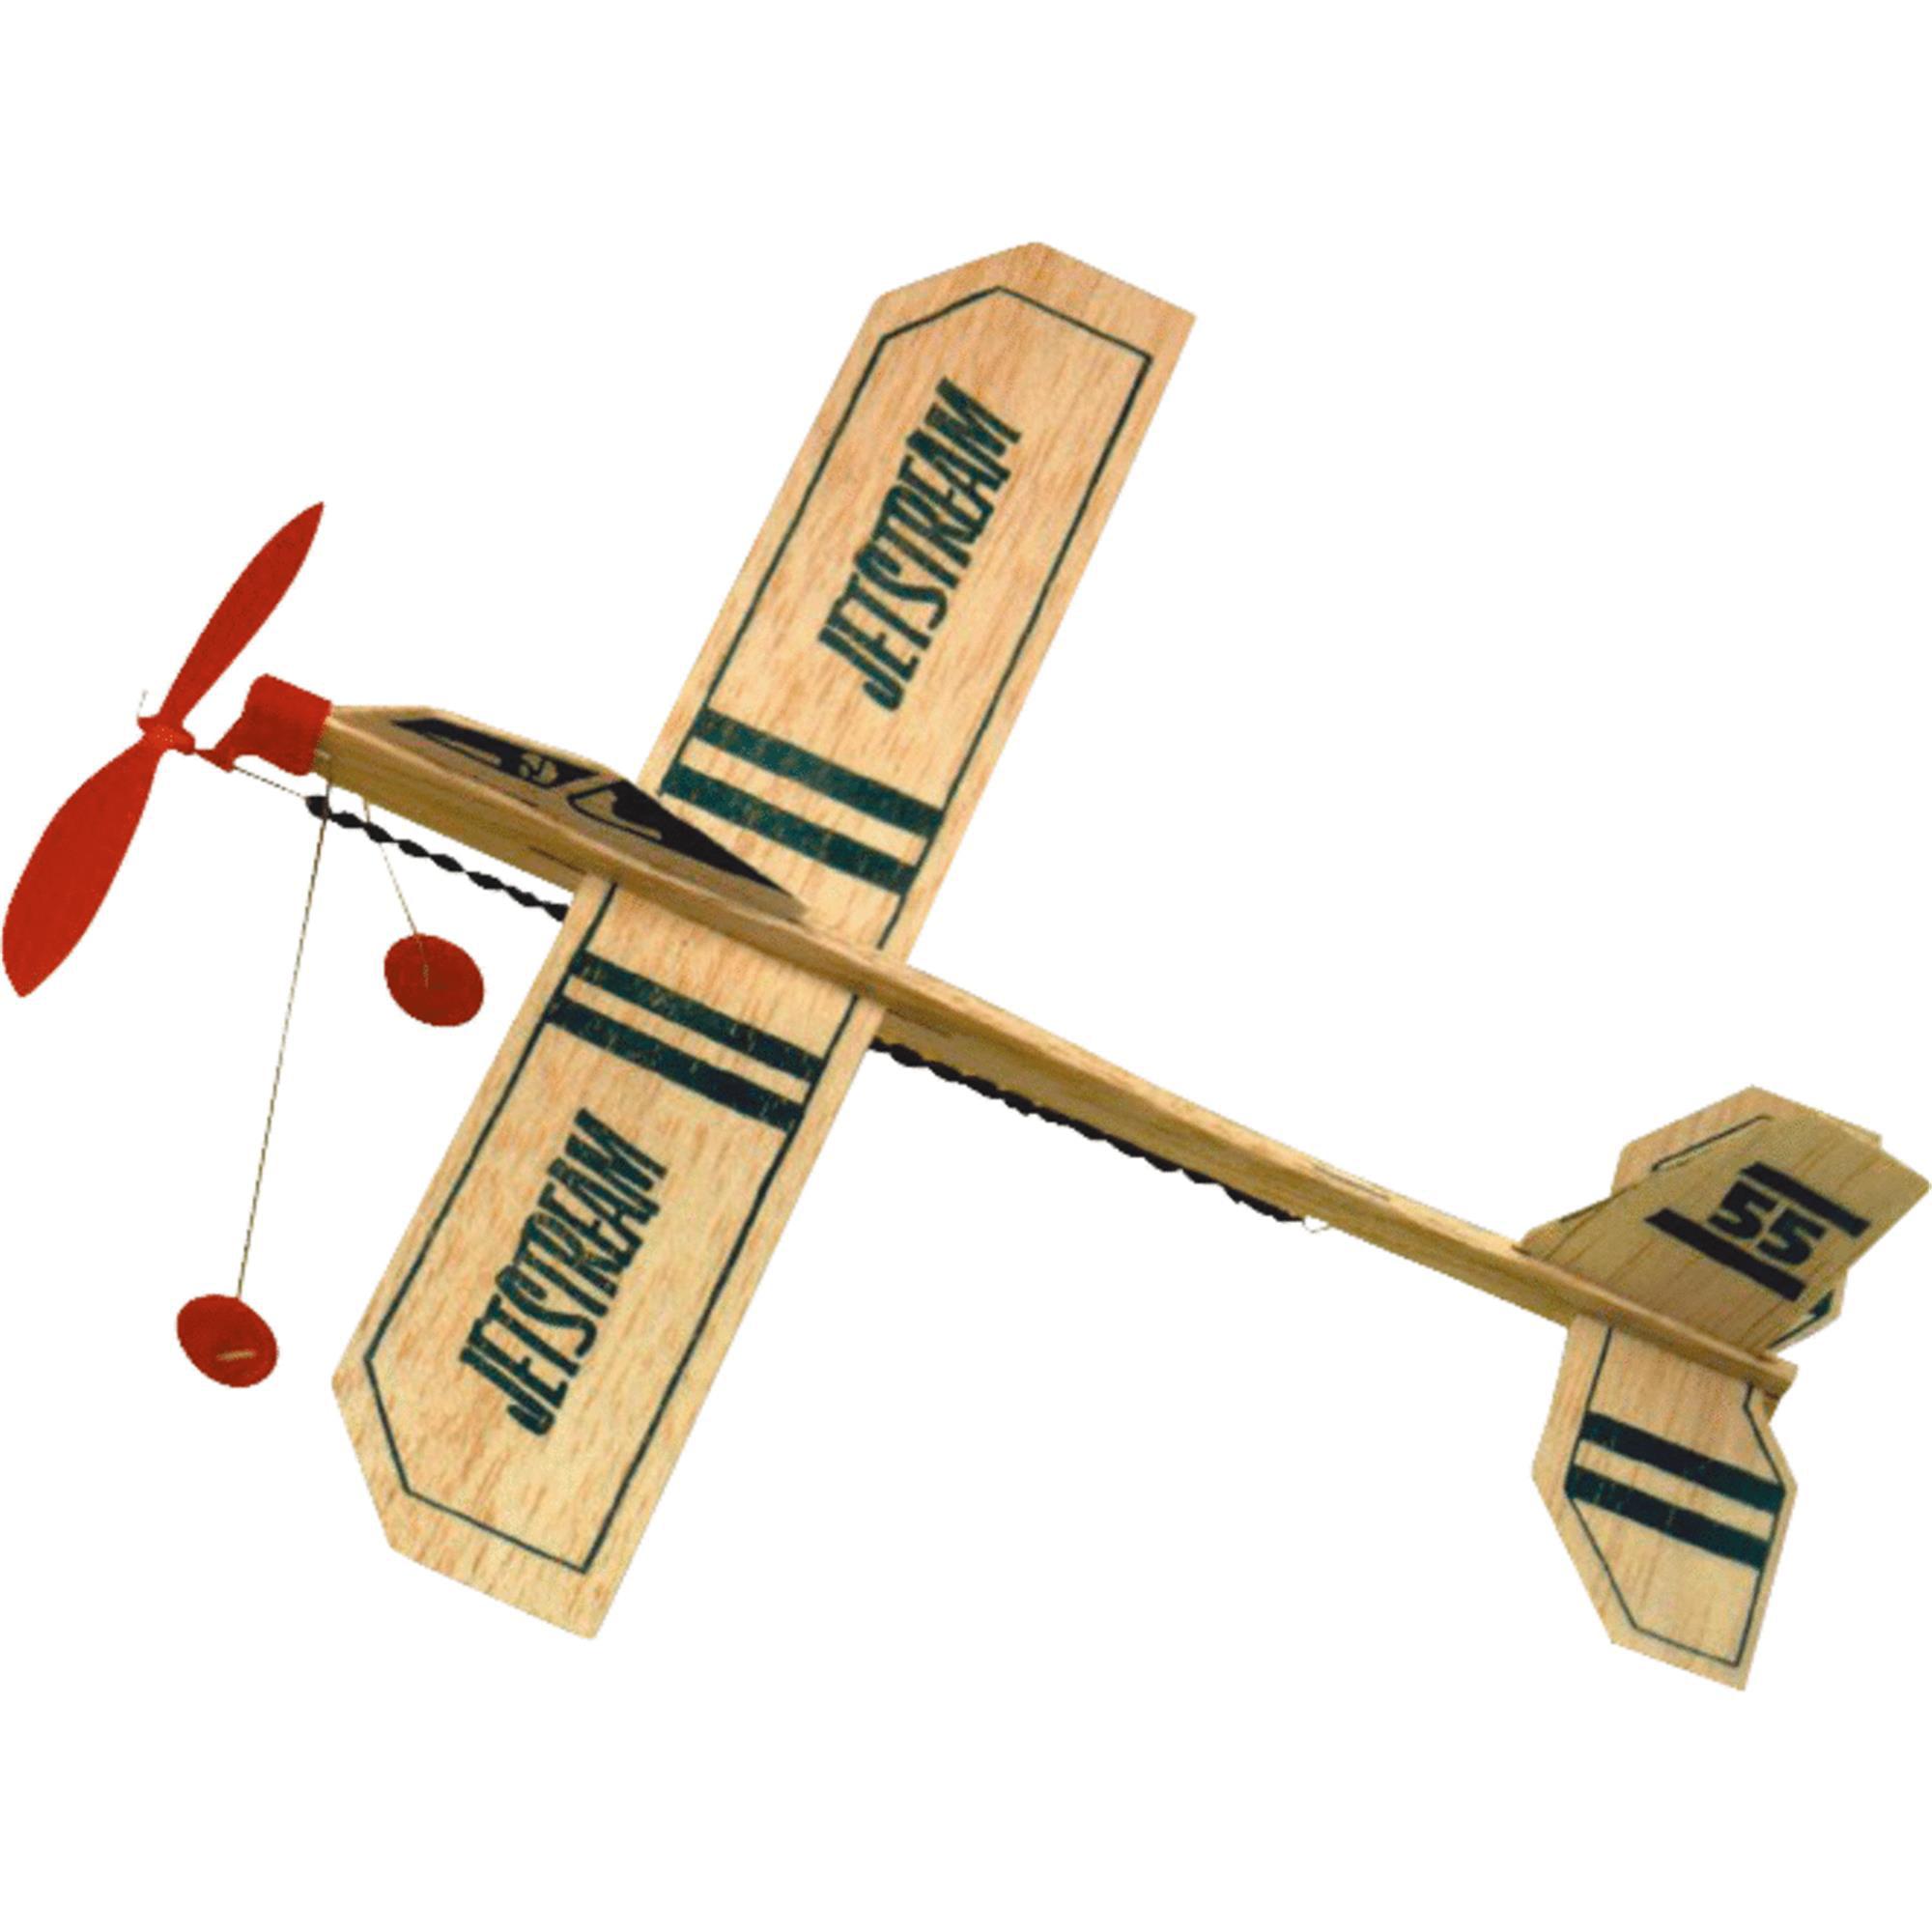 Jetstream Balsa Wood Glider Plane Walmart Com